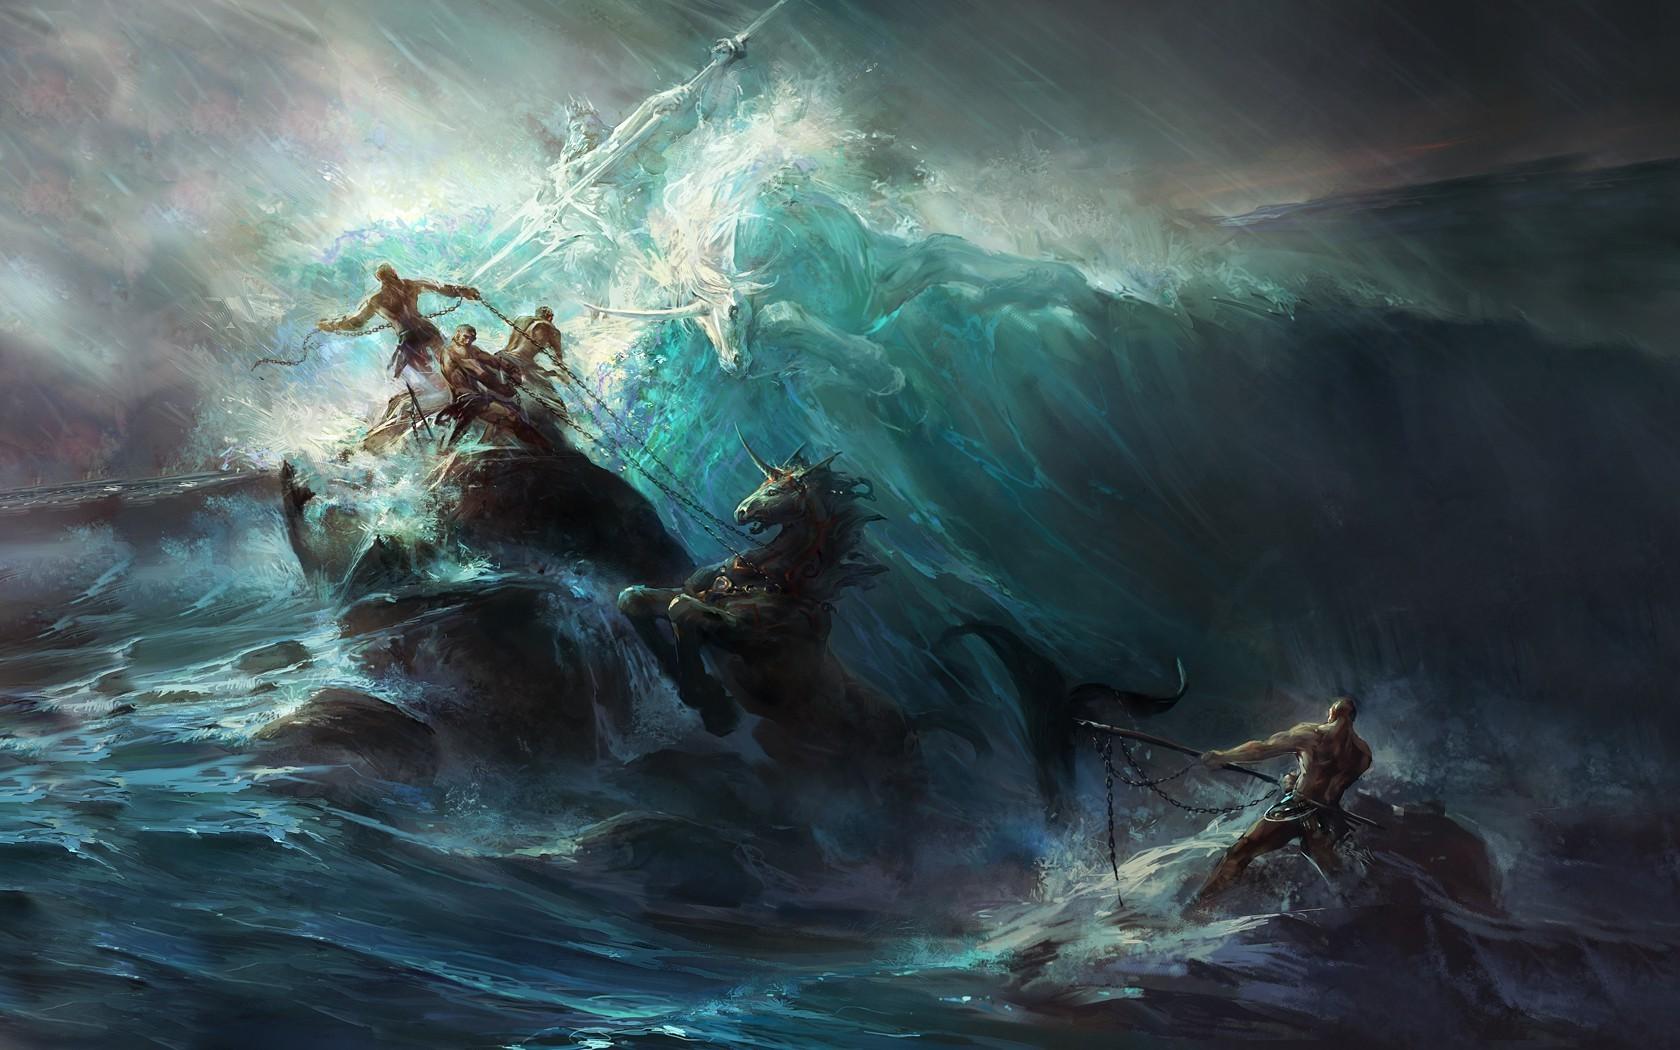 Falling In Reverse Wallpaper 1366x768 Fantasy Art Painting Artwork Poseidon Wallpapers Hd